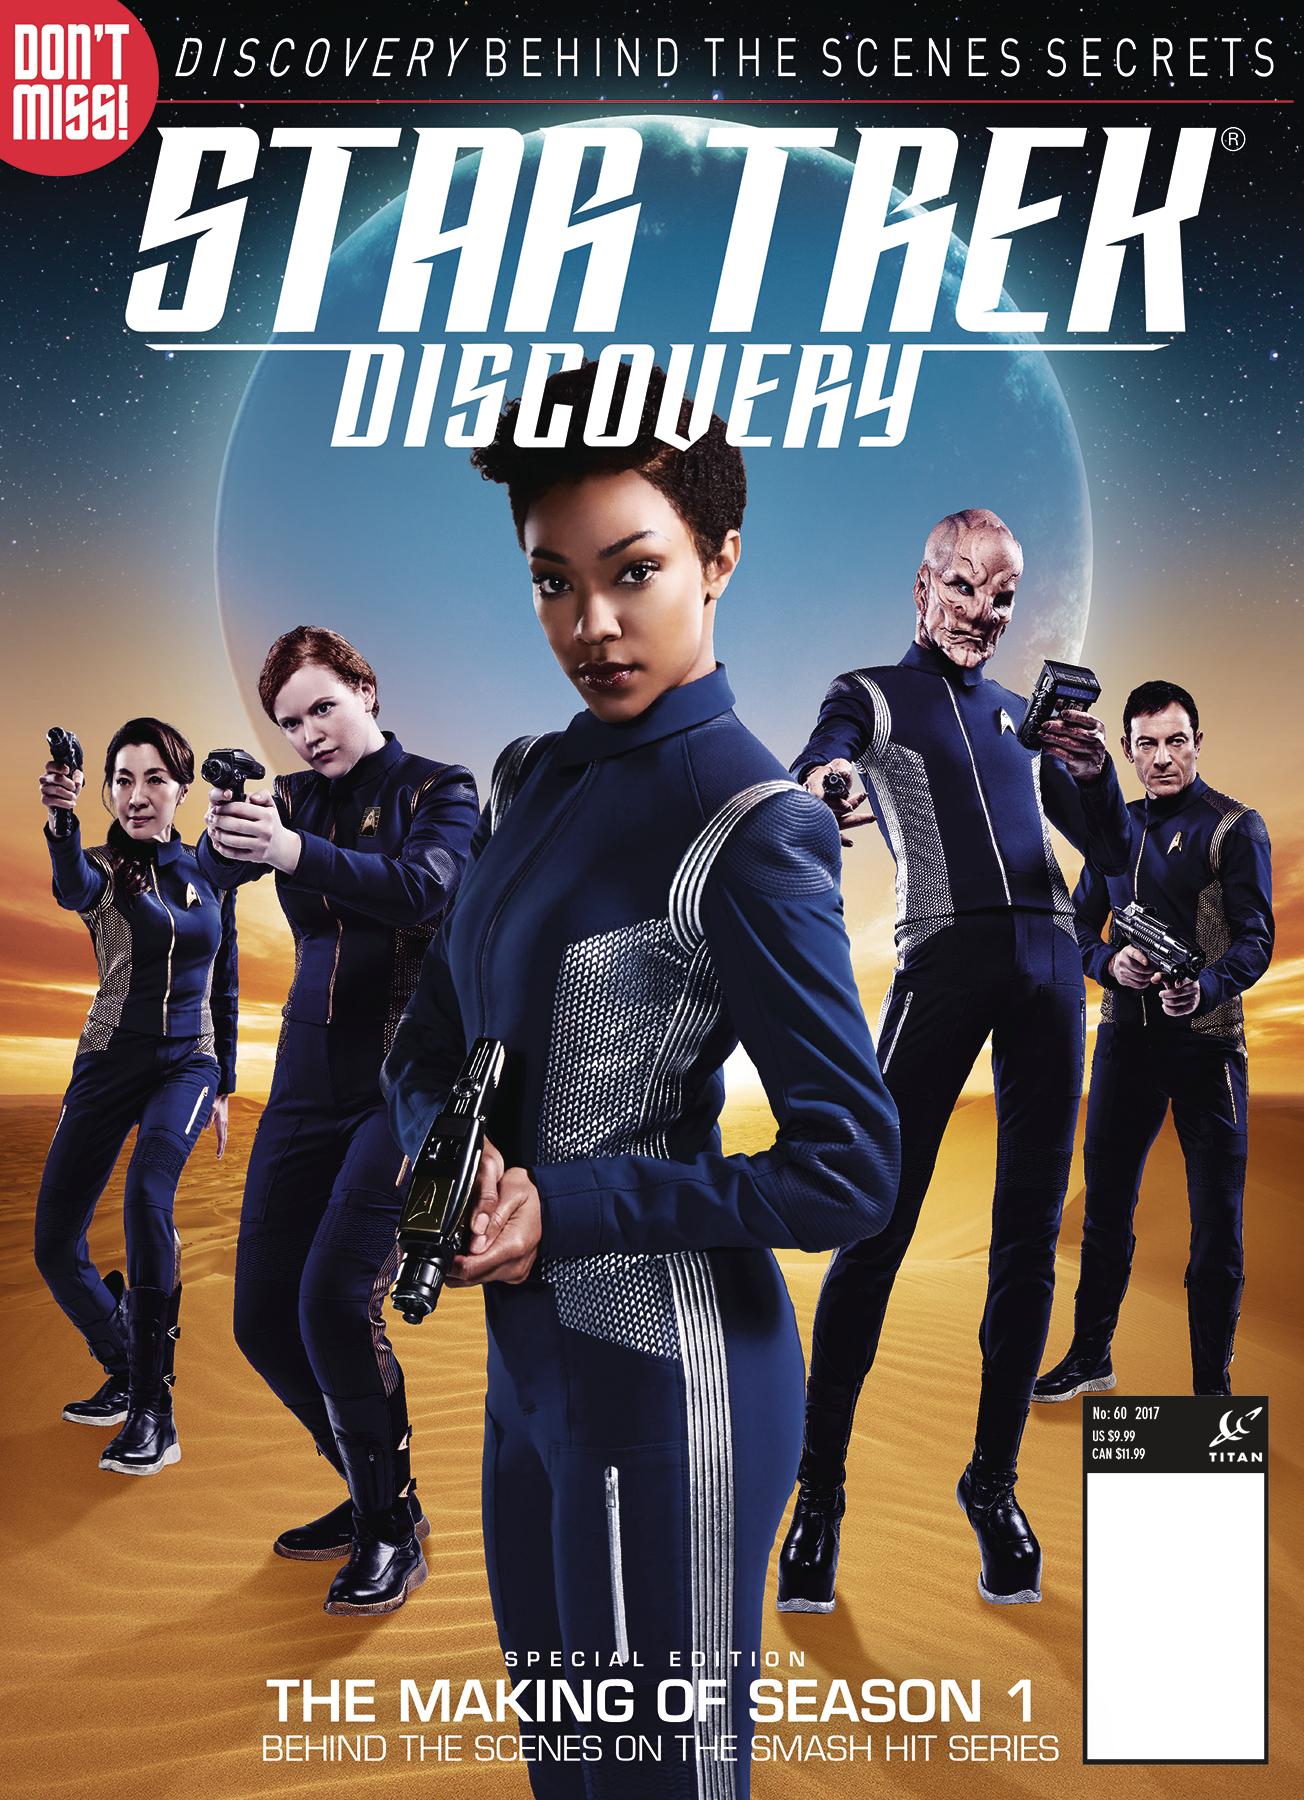 STAR TREK DISCOVERY MAG SPECIAL VOL 2 PX